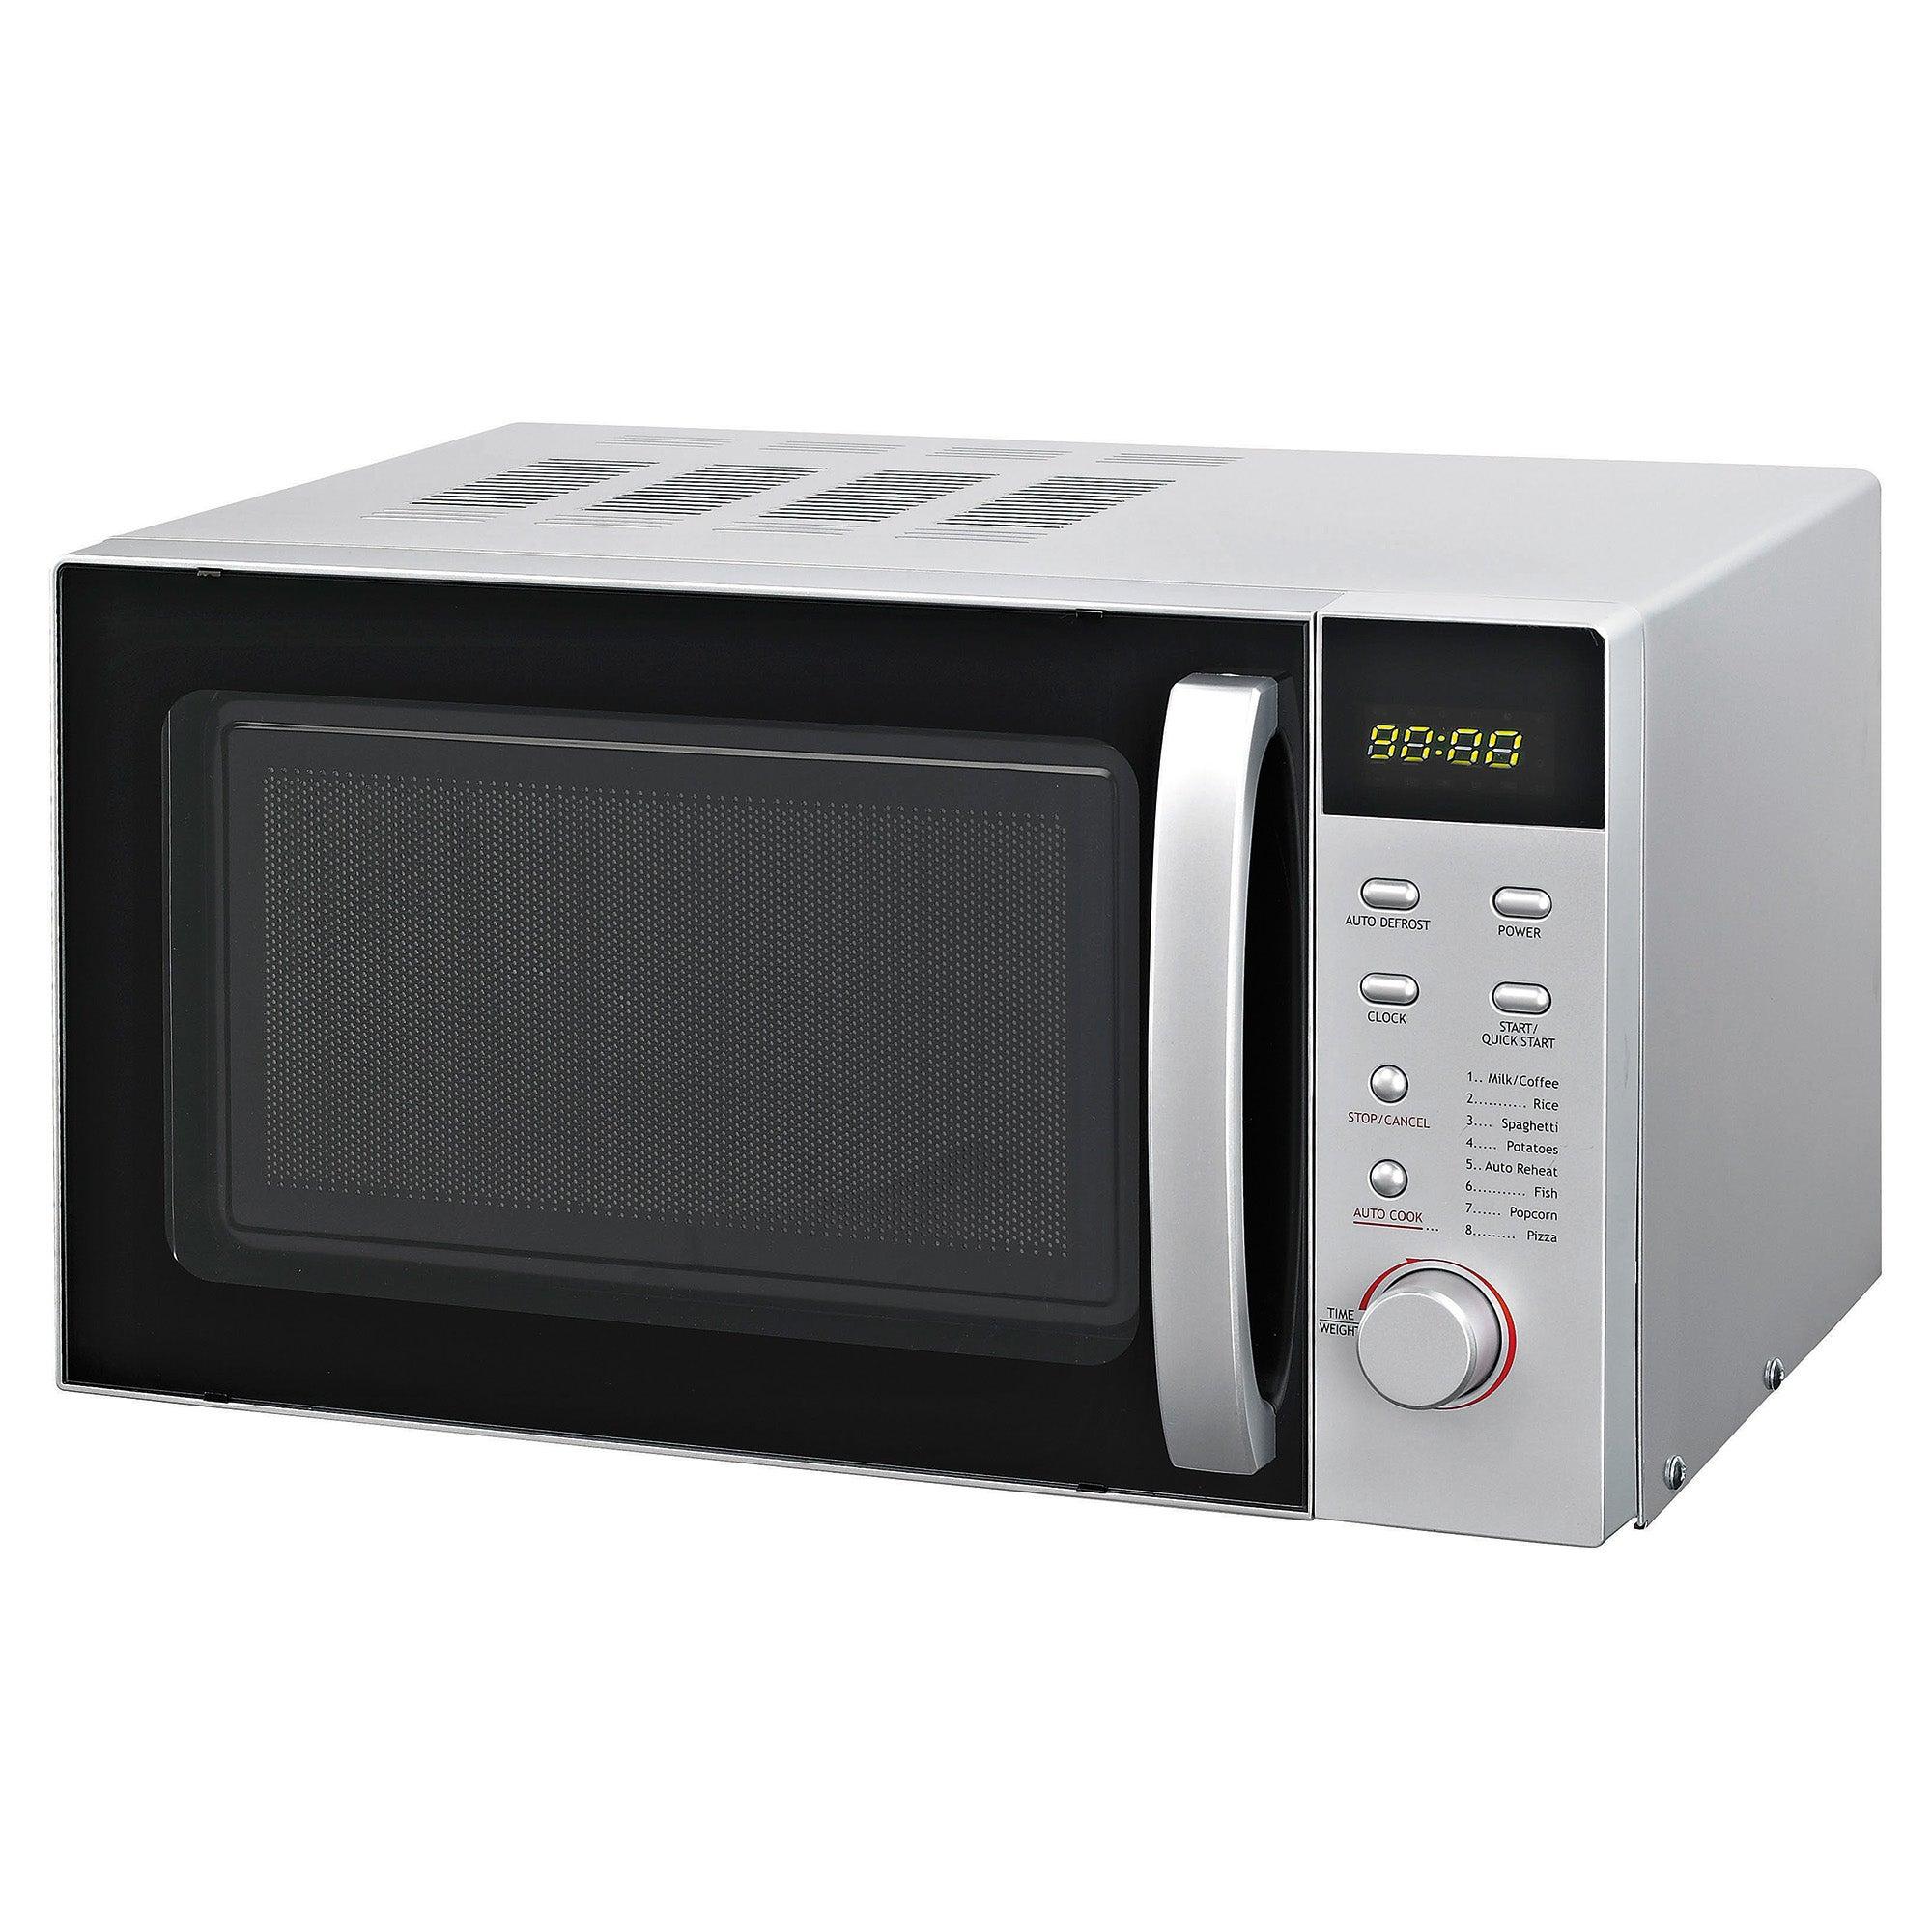 Dunelm 23L Digital Microwave